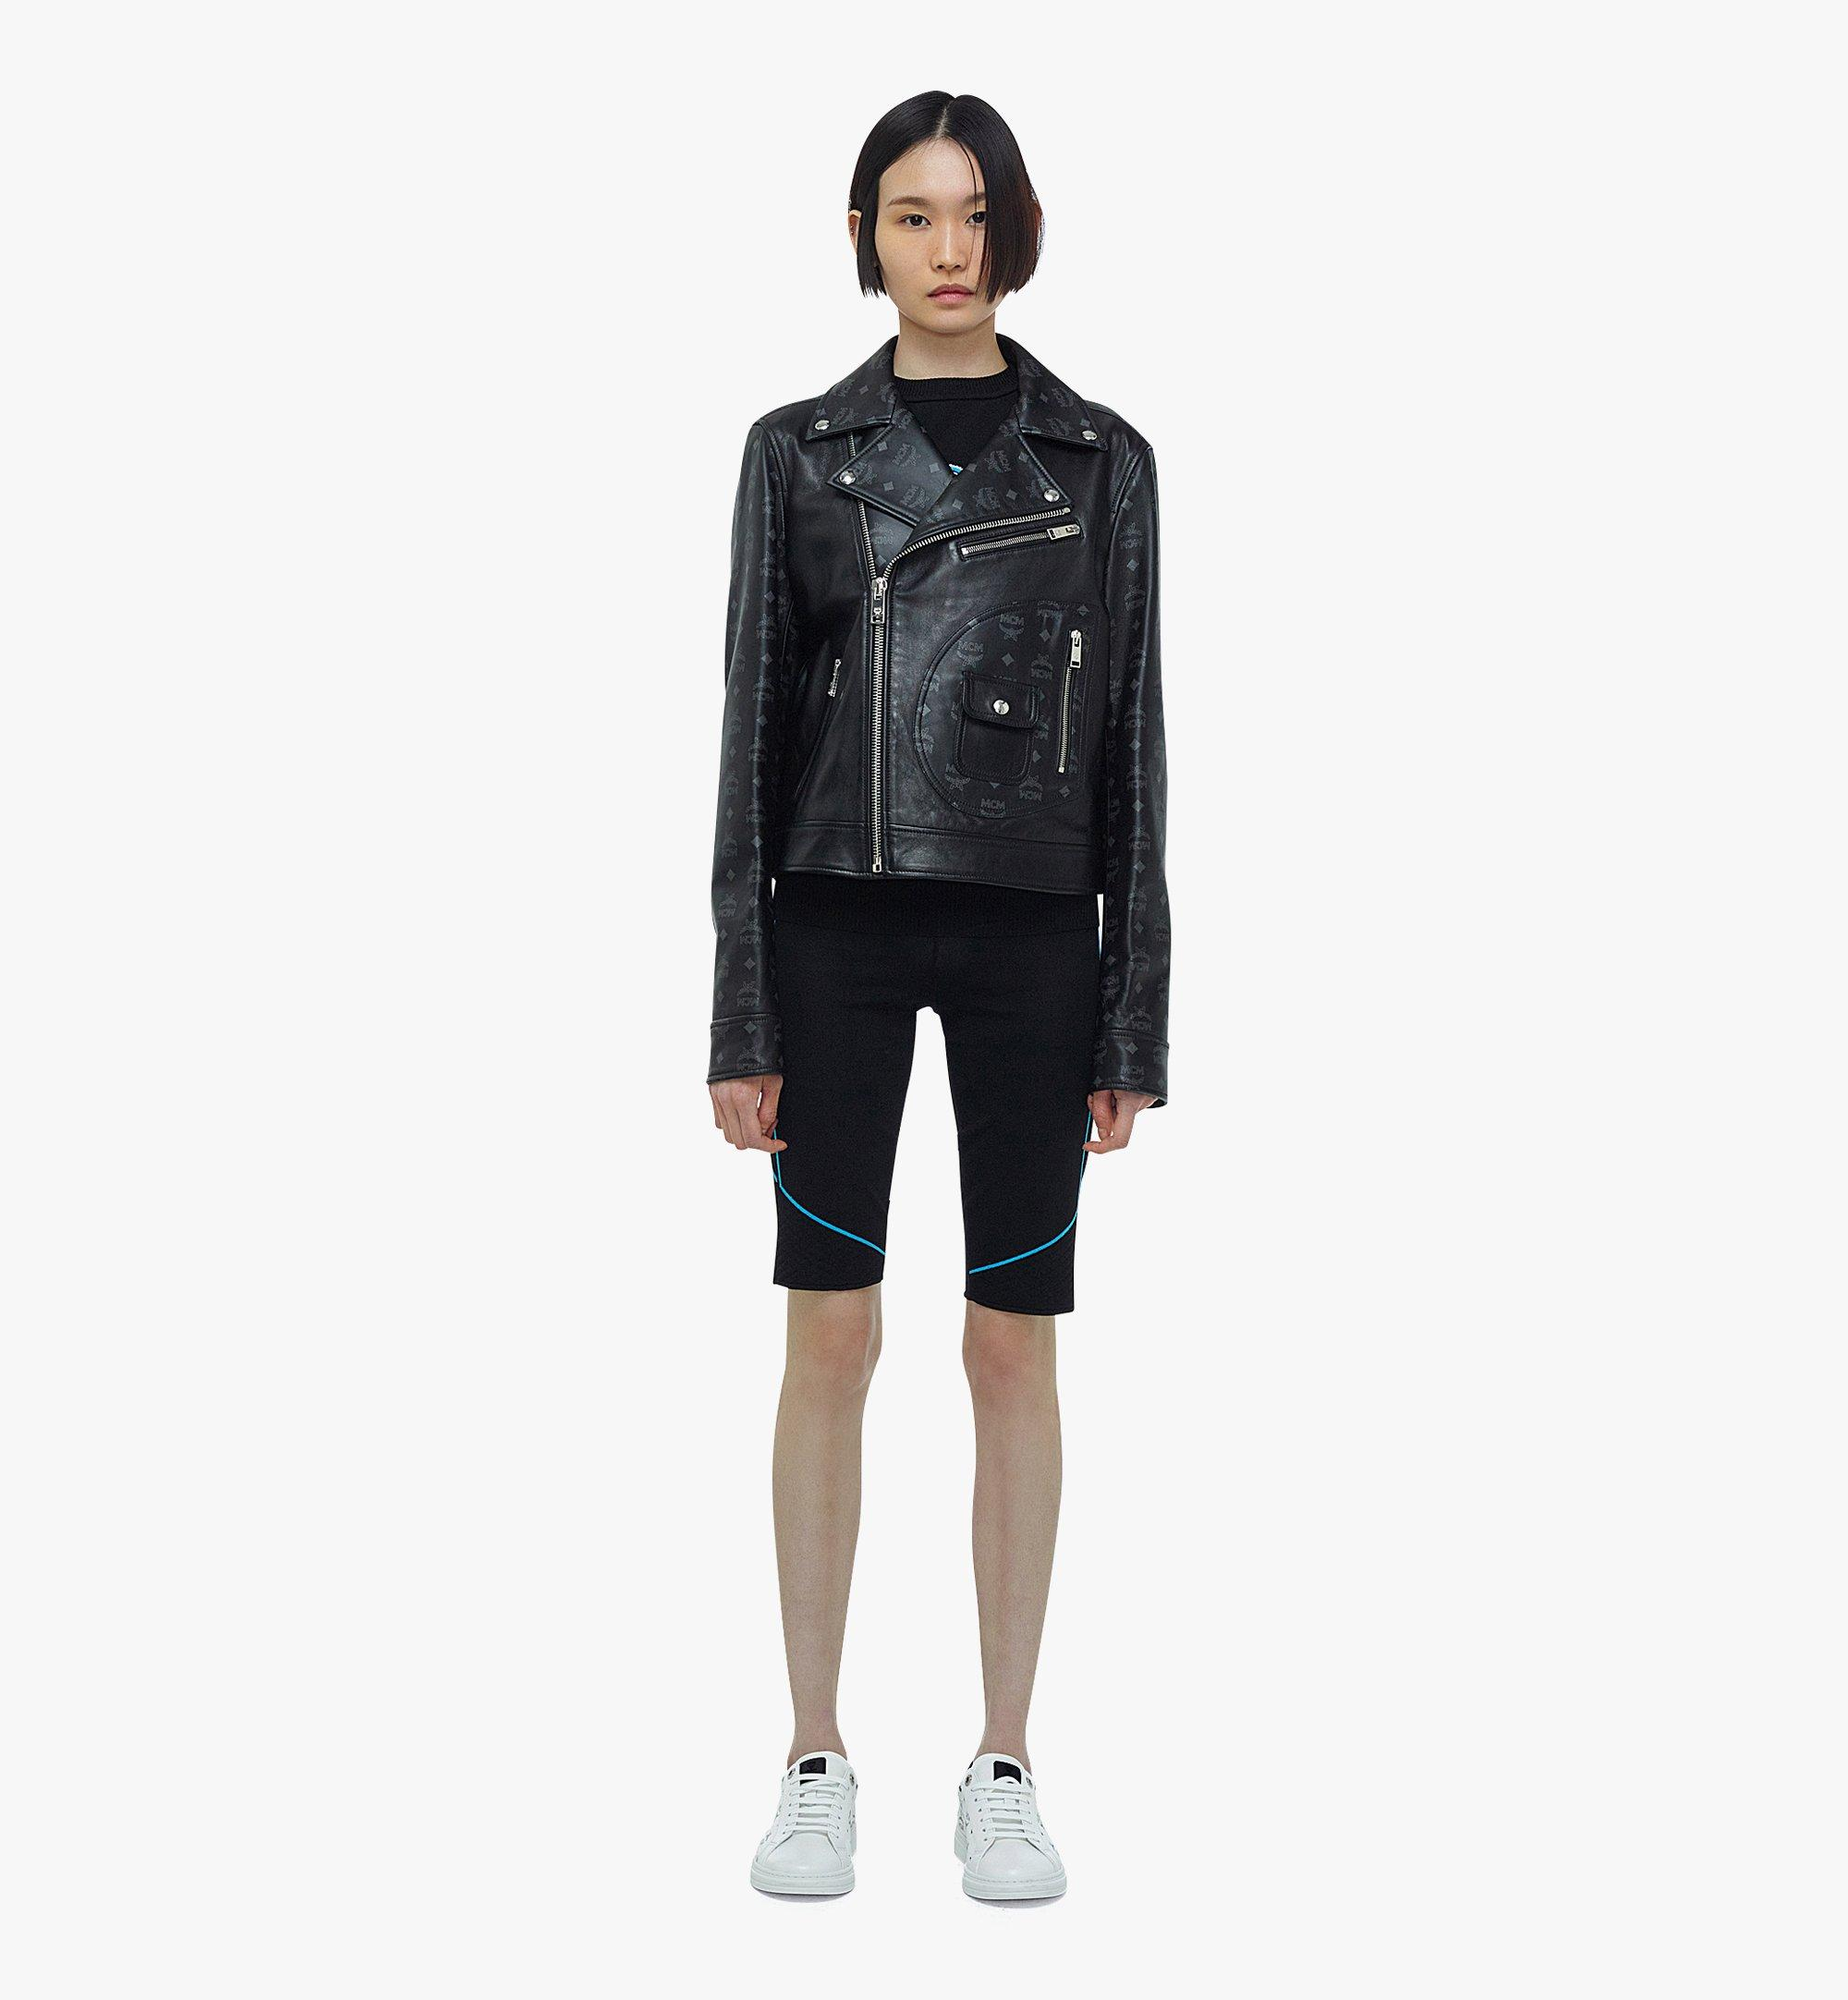 MCM Women's Upcycling Project Monogram Leather Jacket Black MFJBAUP01BK040 Alternate View 3